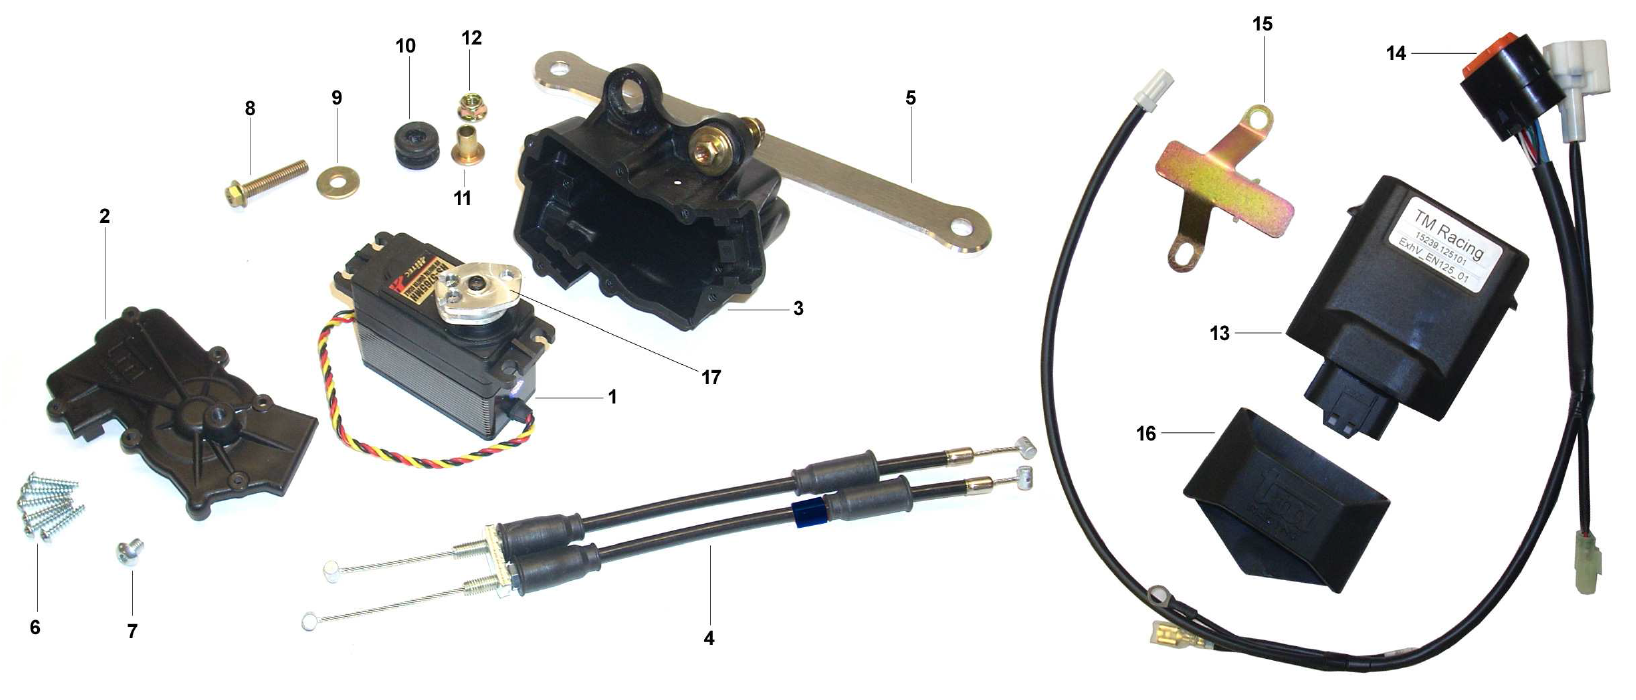 Valve Motor